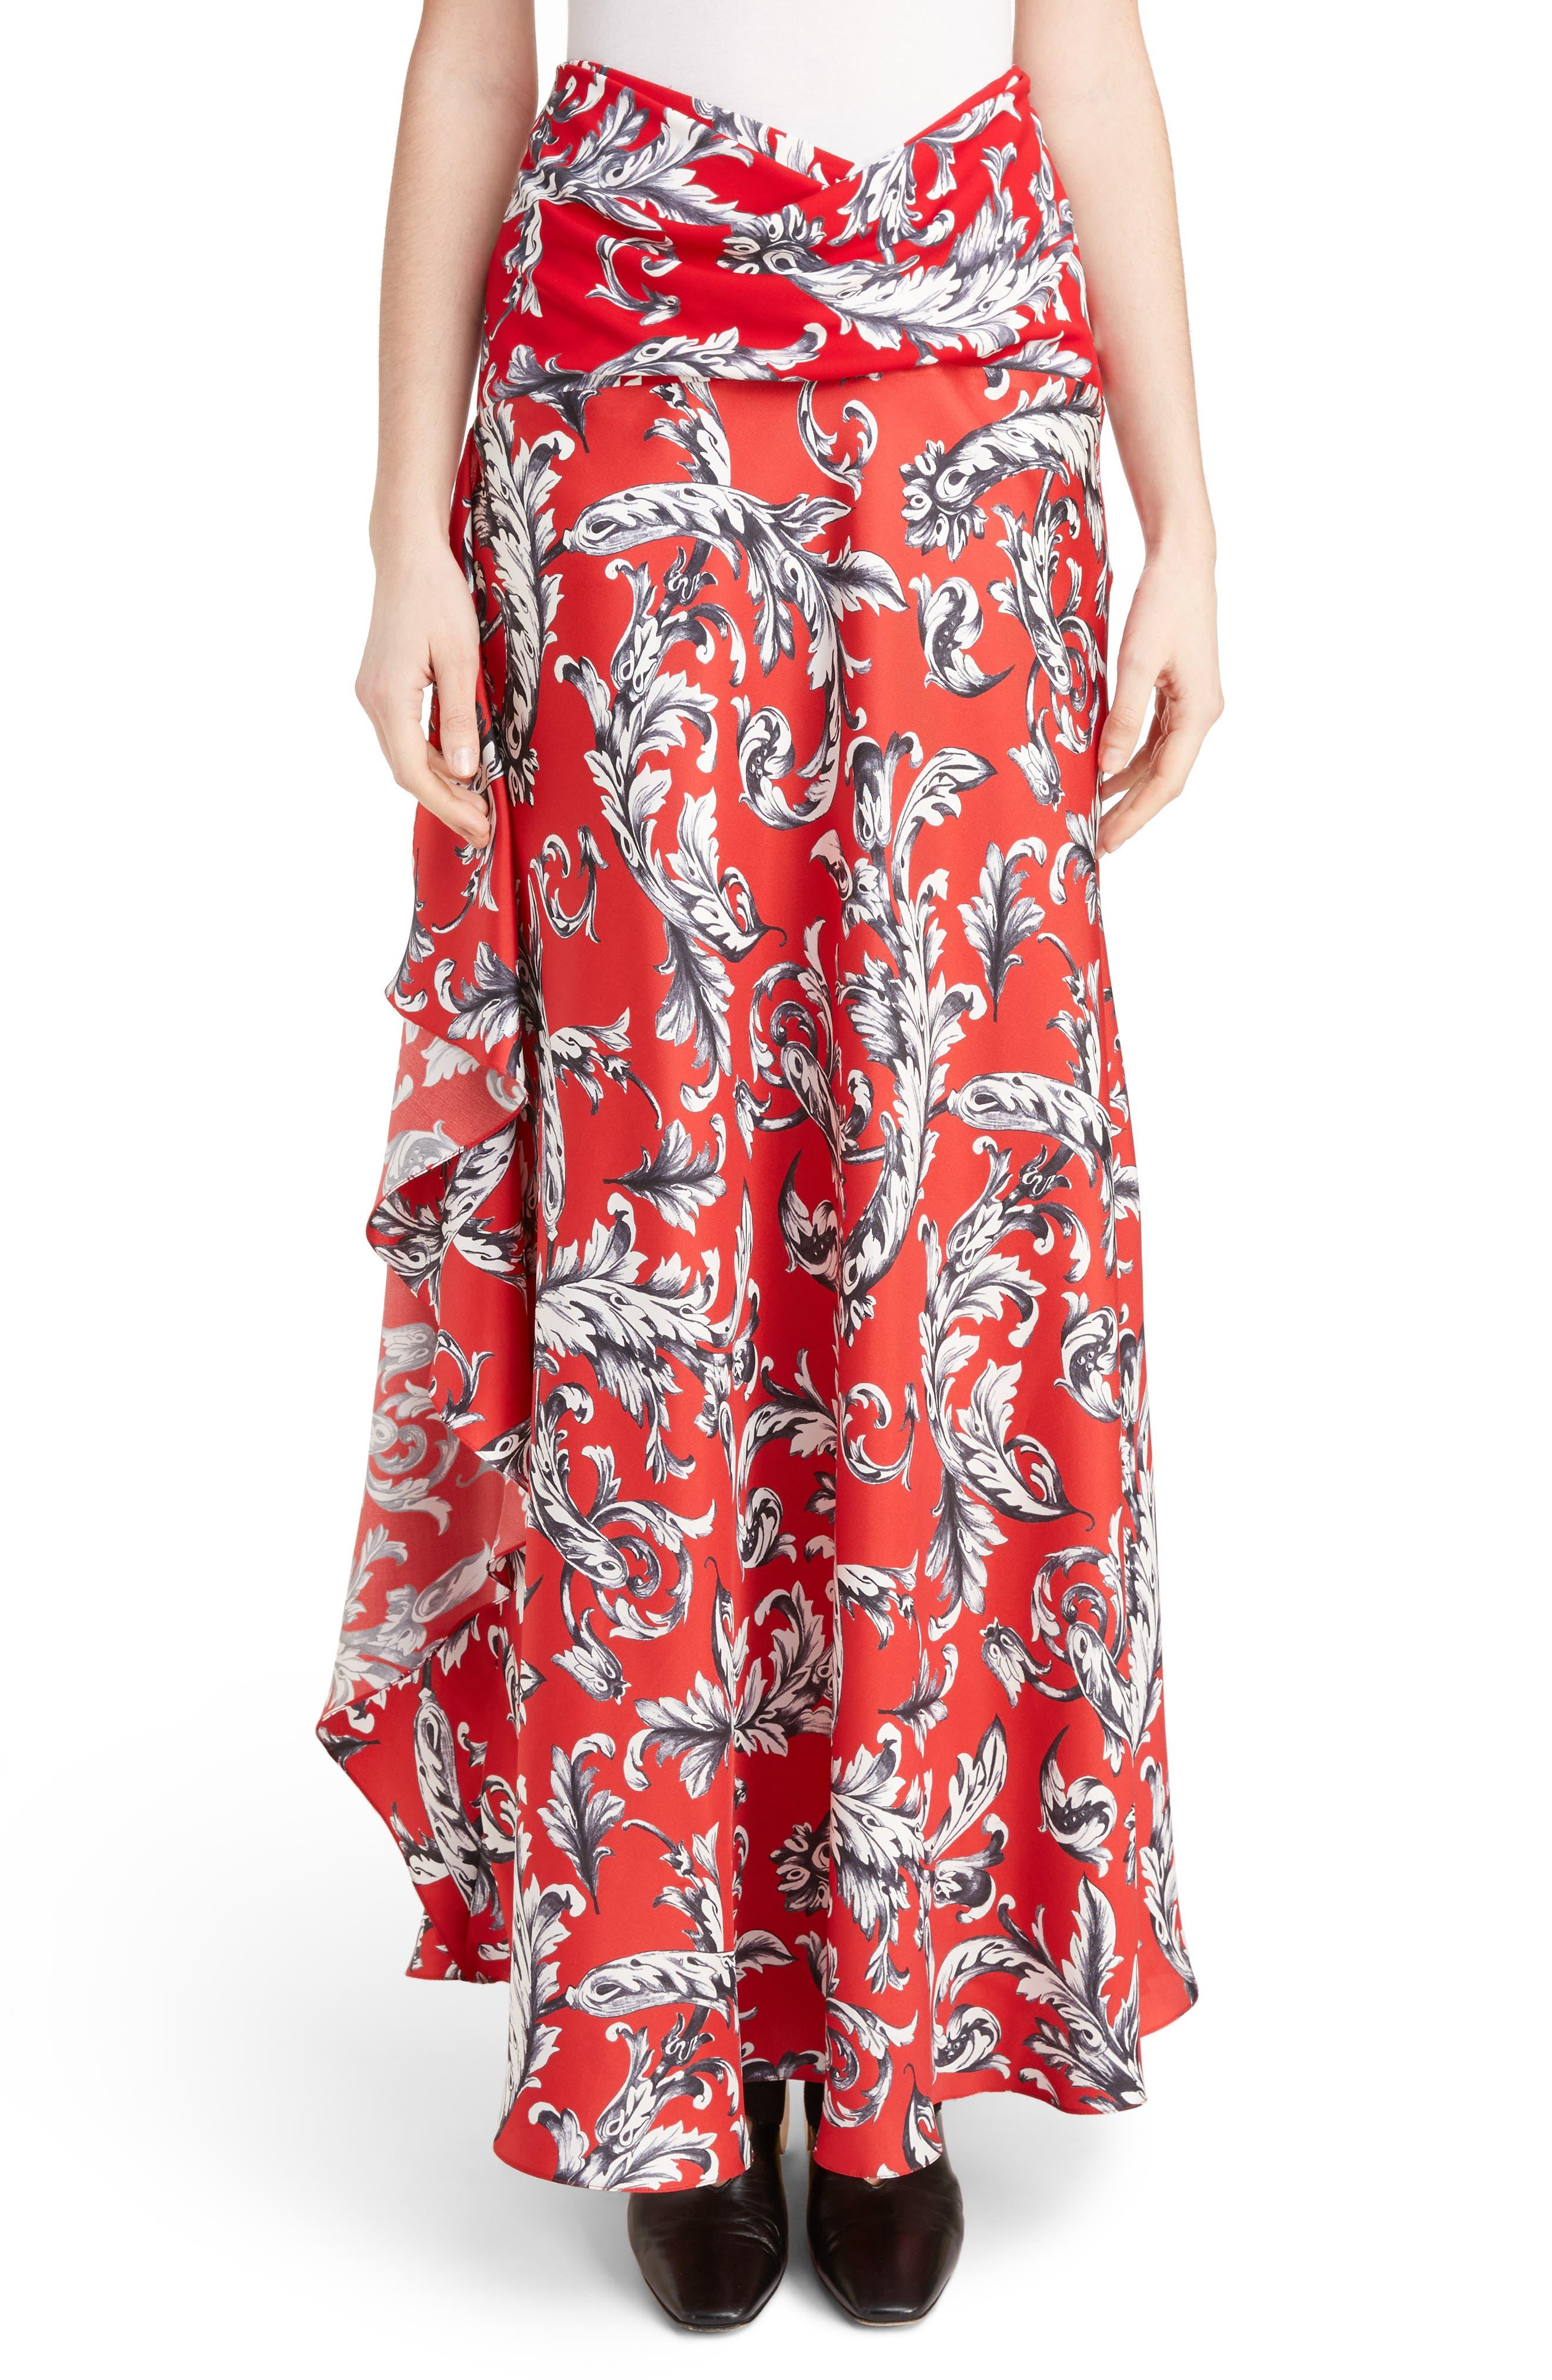 J.W.ANDERSON Filigree Print Asymmetrical Maxi Skirt,                         Main,                         color, Cherry